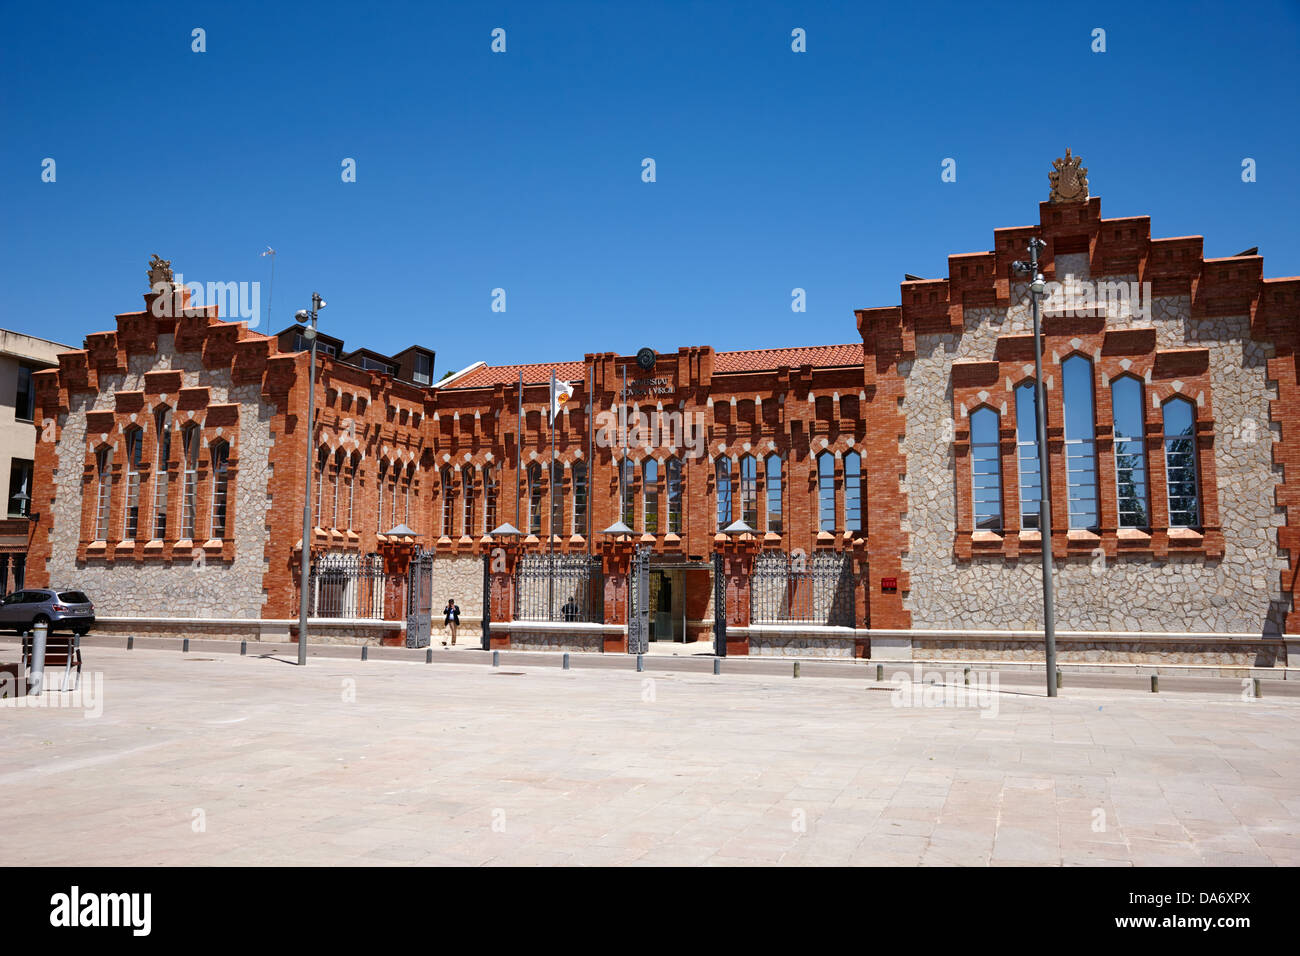 rectorat universitat rovira i virgili in the former municipal slaugherhouse tarragona catalonia spain - Stock Image